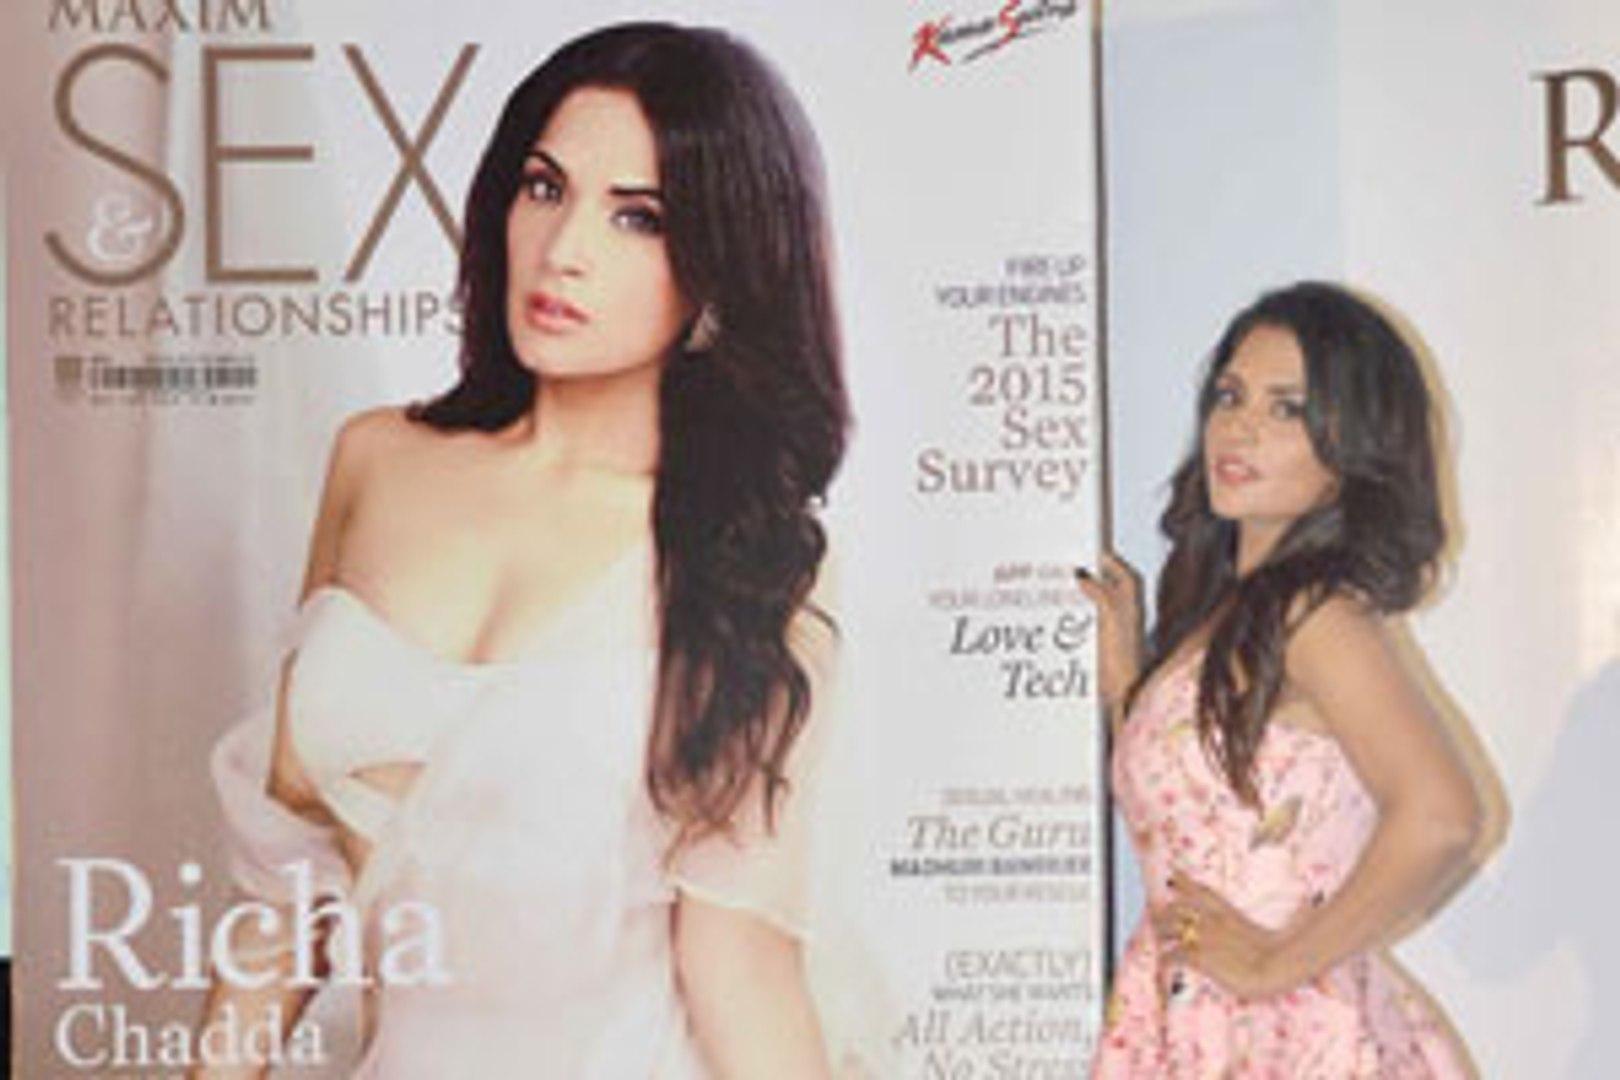 Catch Richa Chadda talk about SEX!